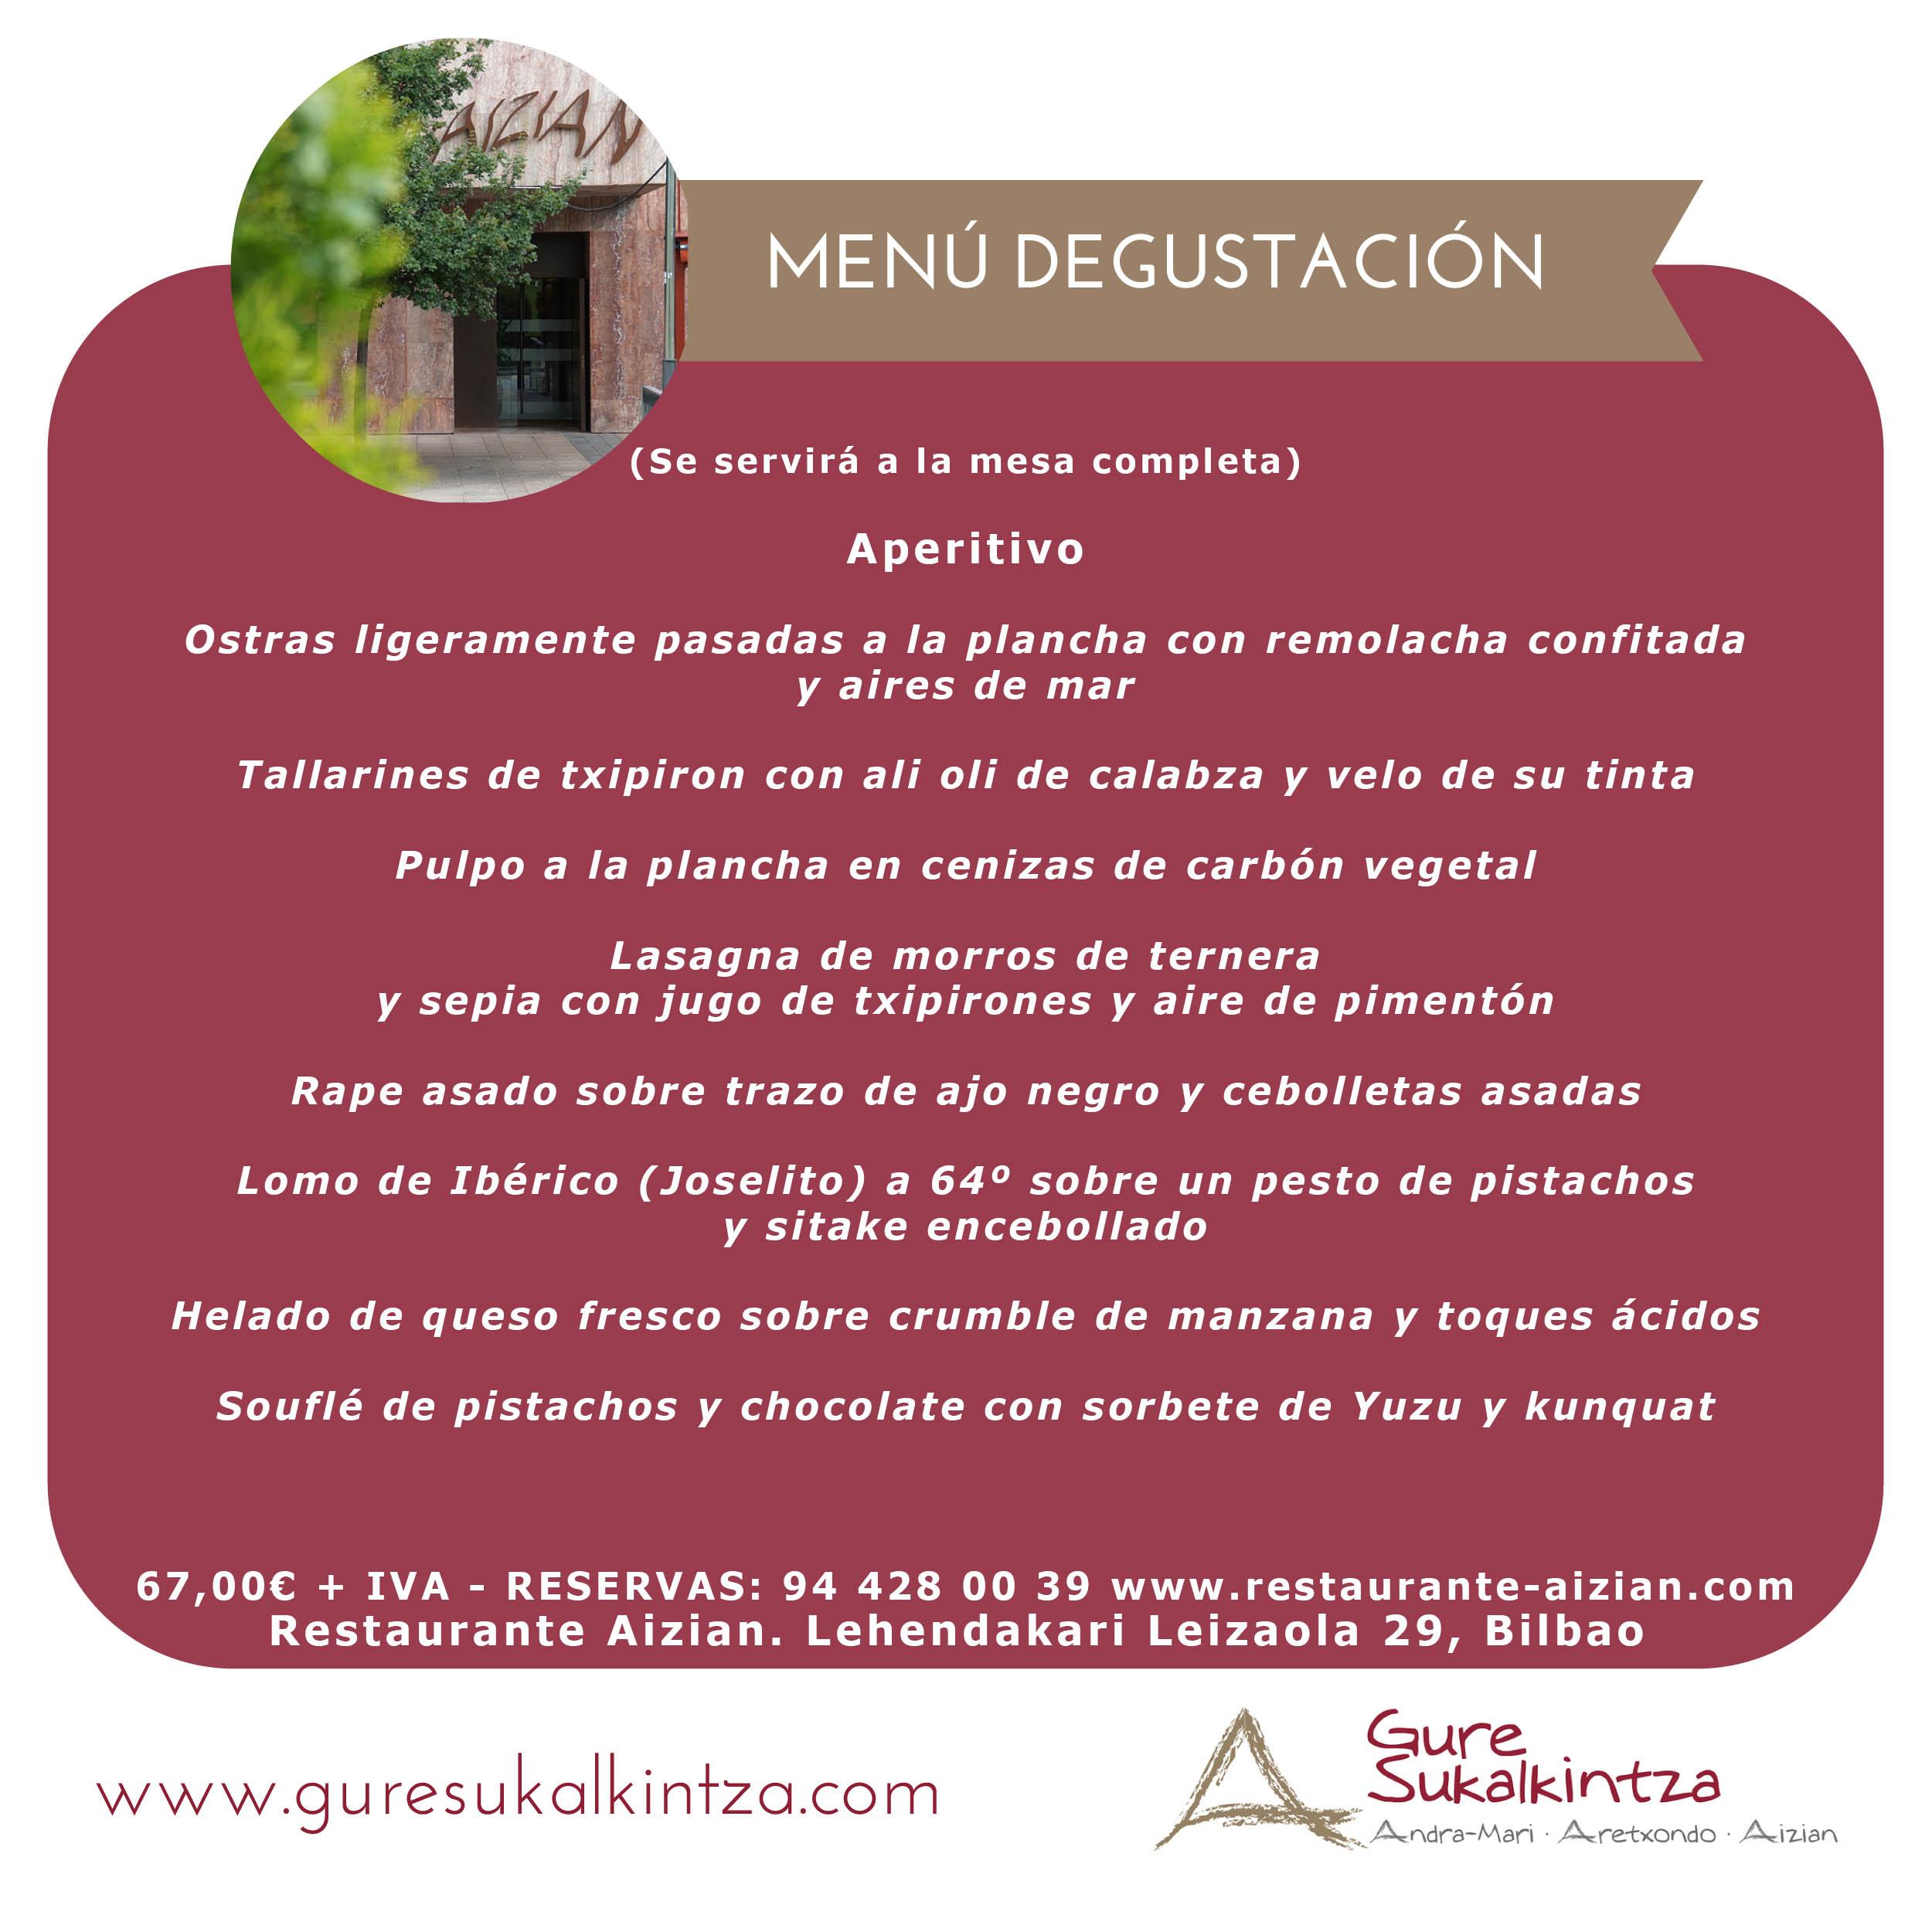 menu_degustacion_aizian_marzo